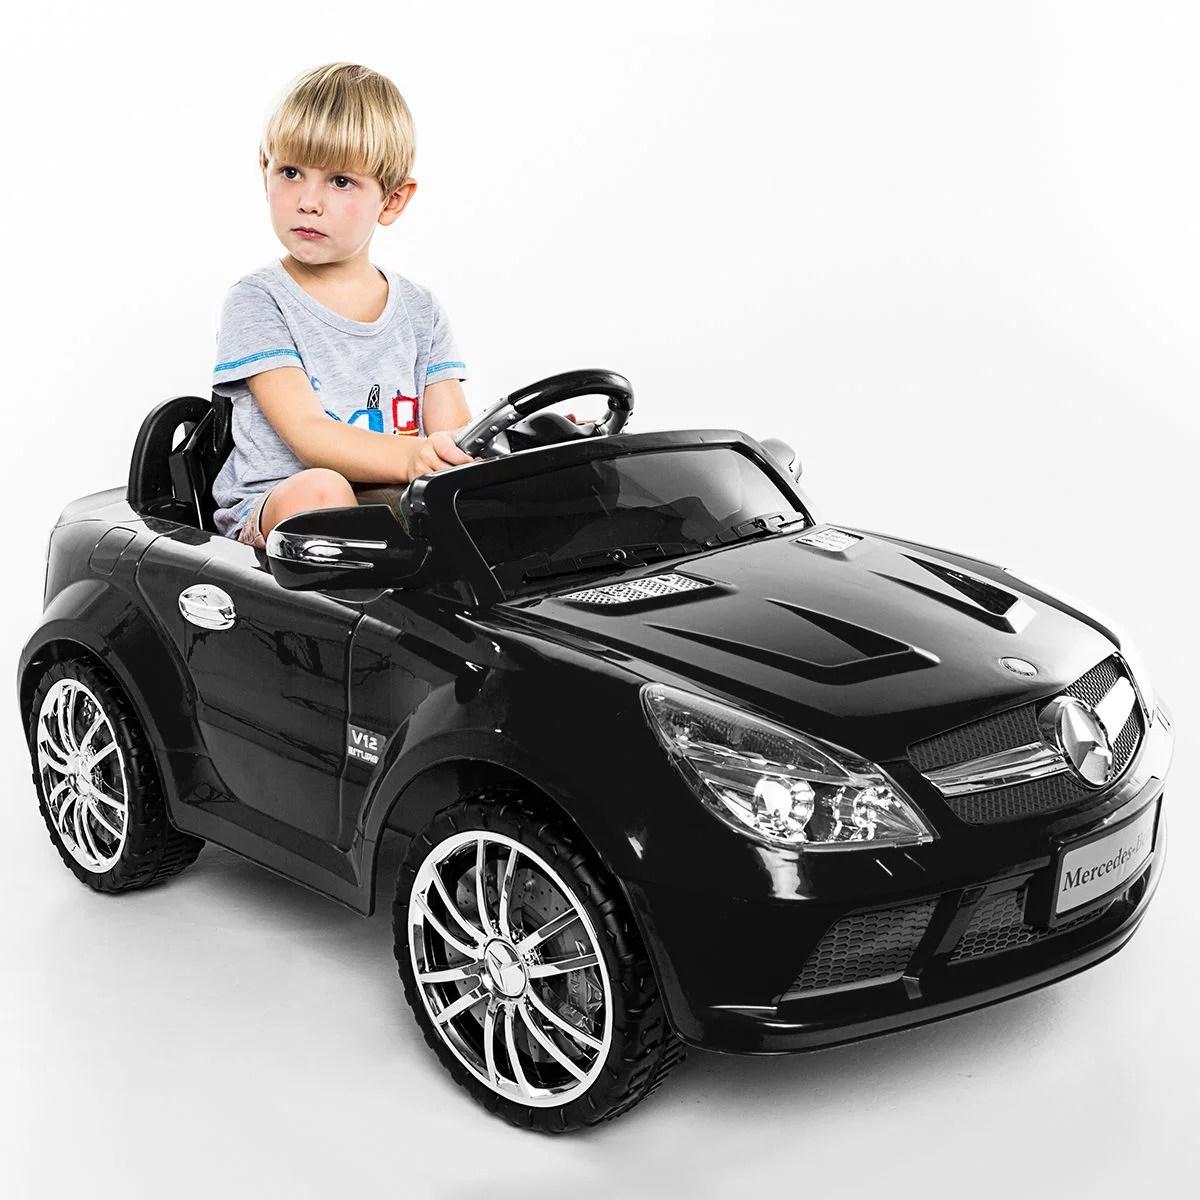 Costway 12v Mercedes Benz Sl65 Electric Kids Ride On Car